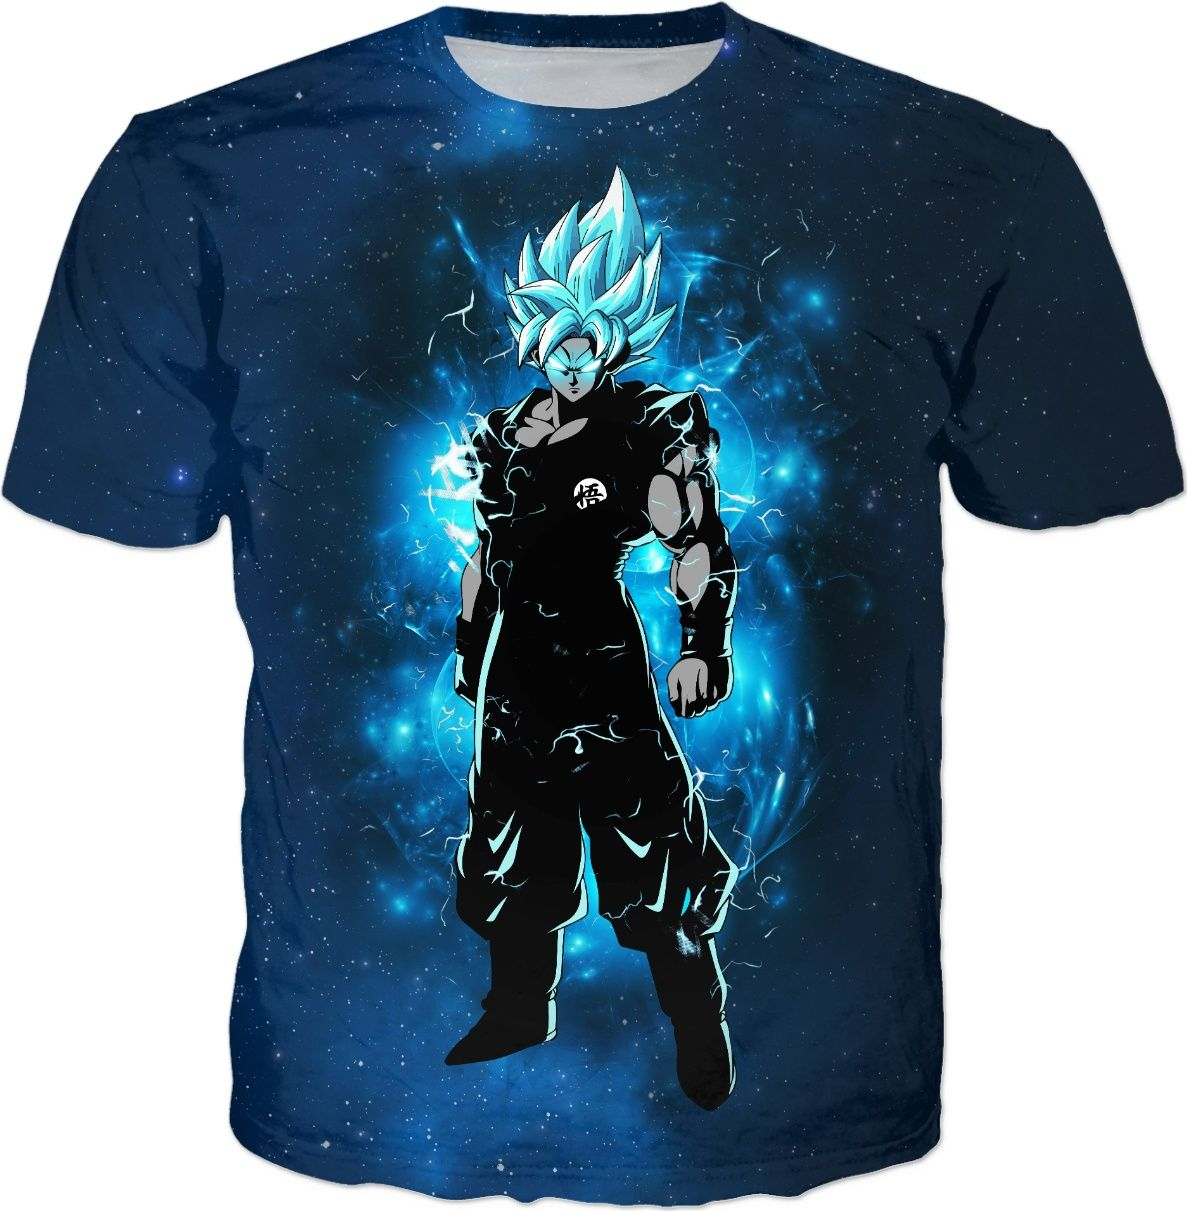 Goku super saiyan blue all over t-shirt | Displate thumbnail